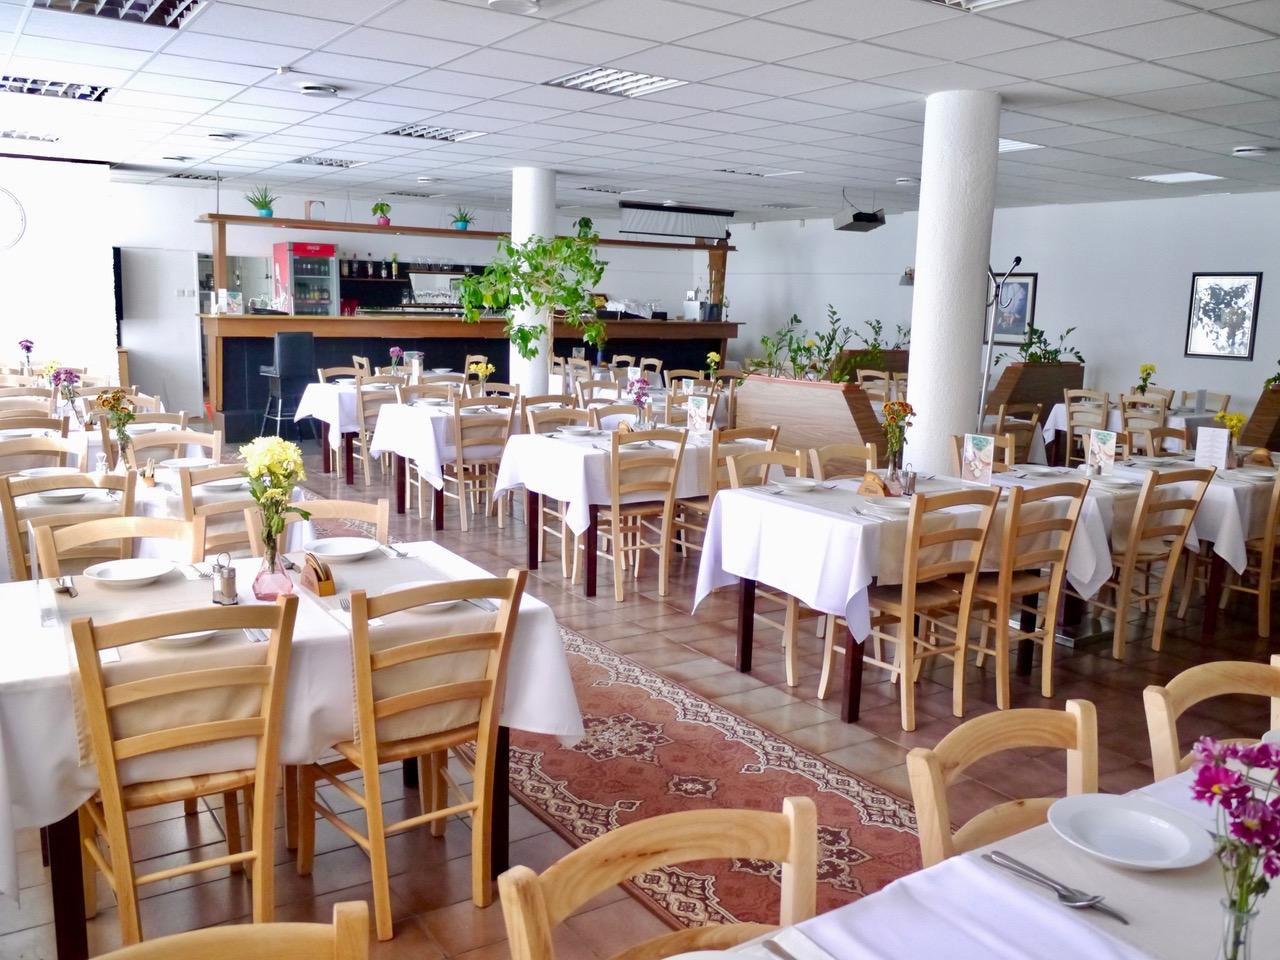 reštaurácia Delfín: Interiér reštaurácie, foto: reštaurácia Delfín